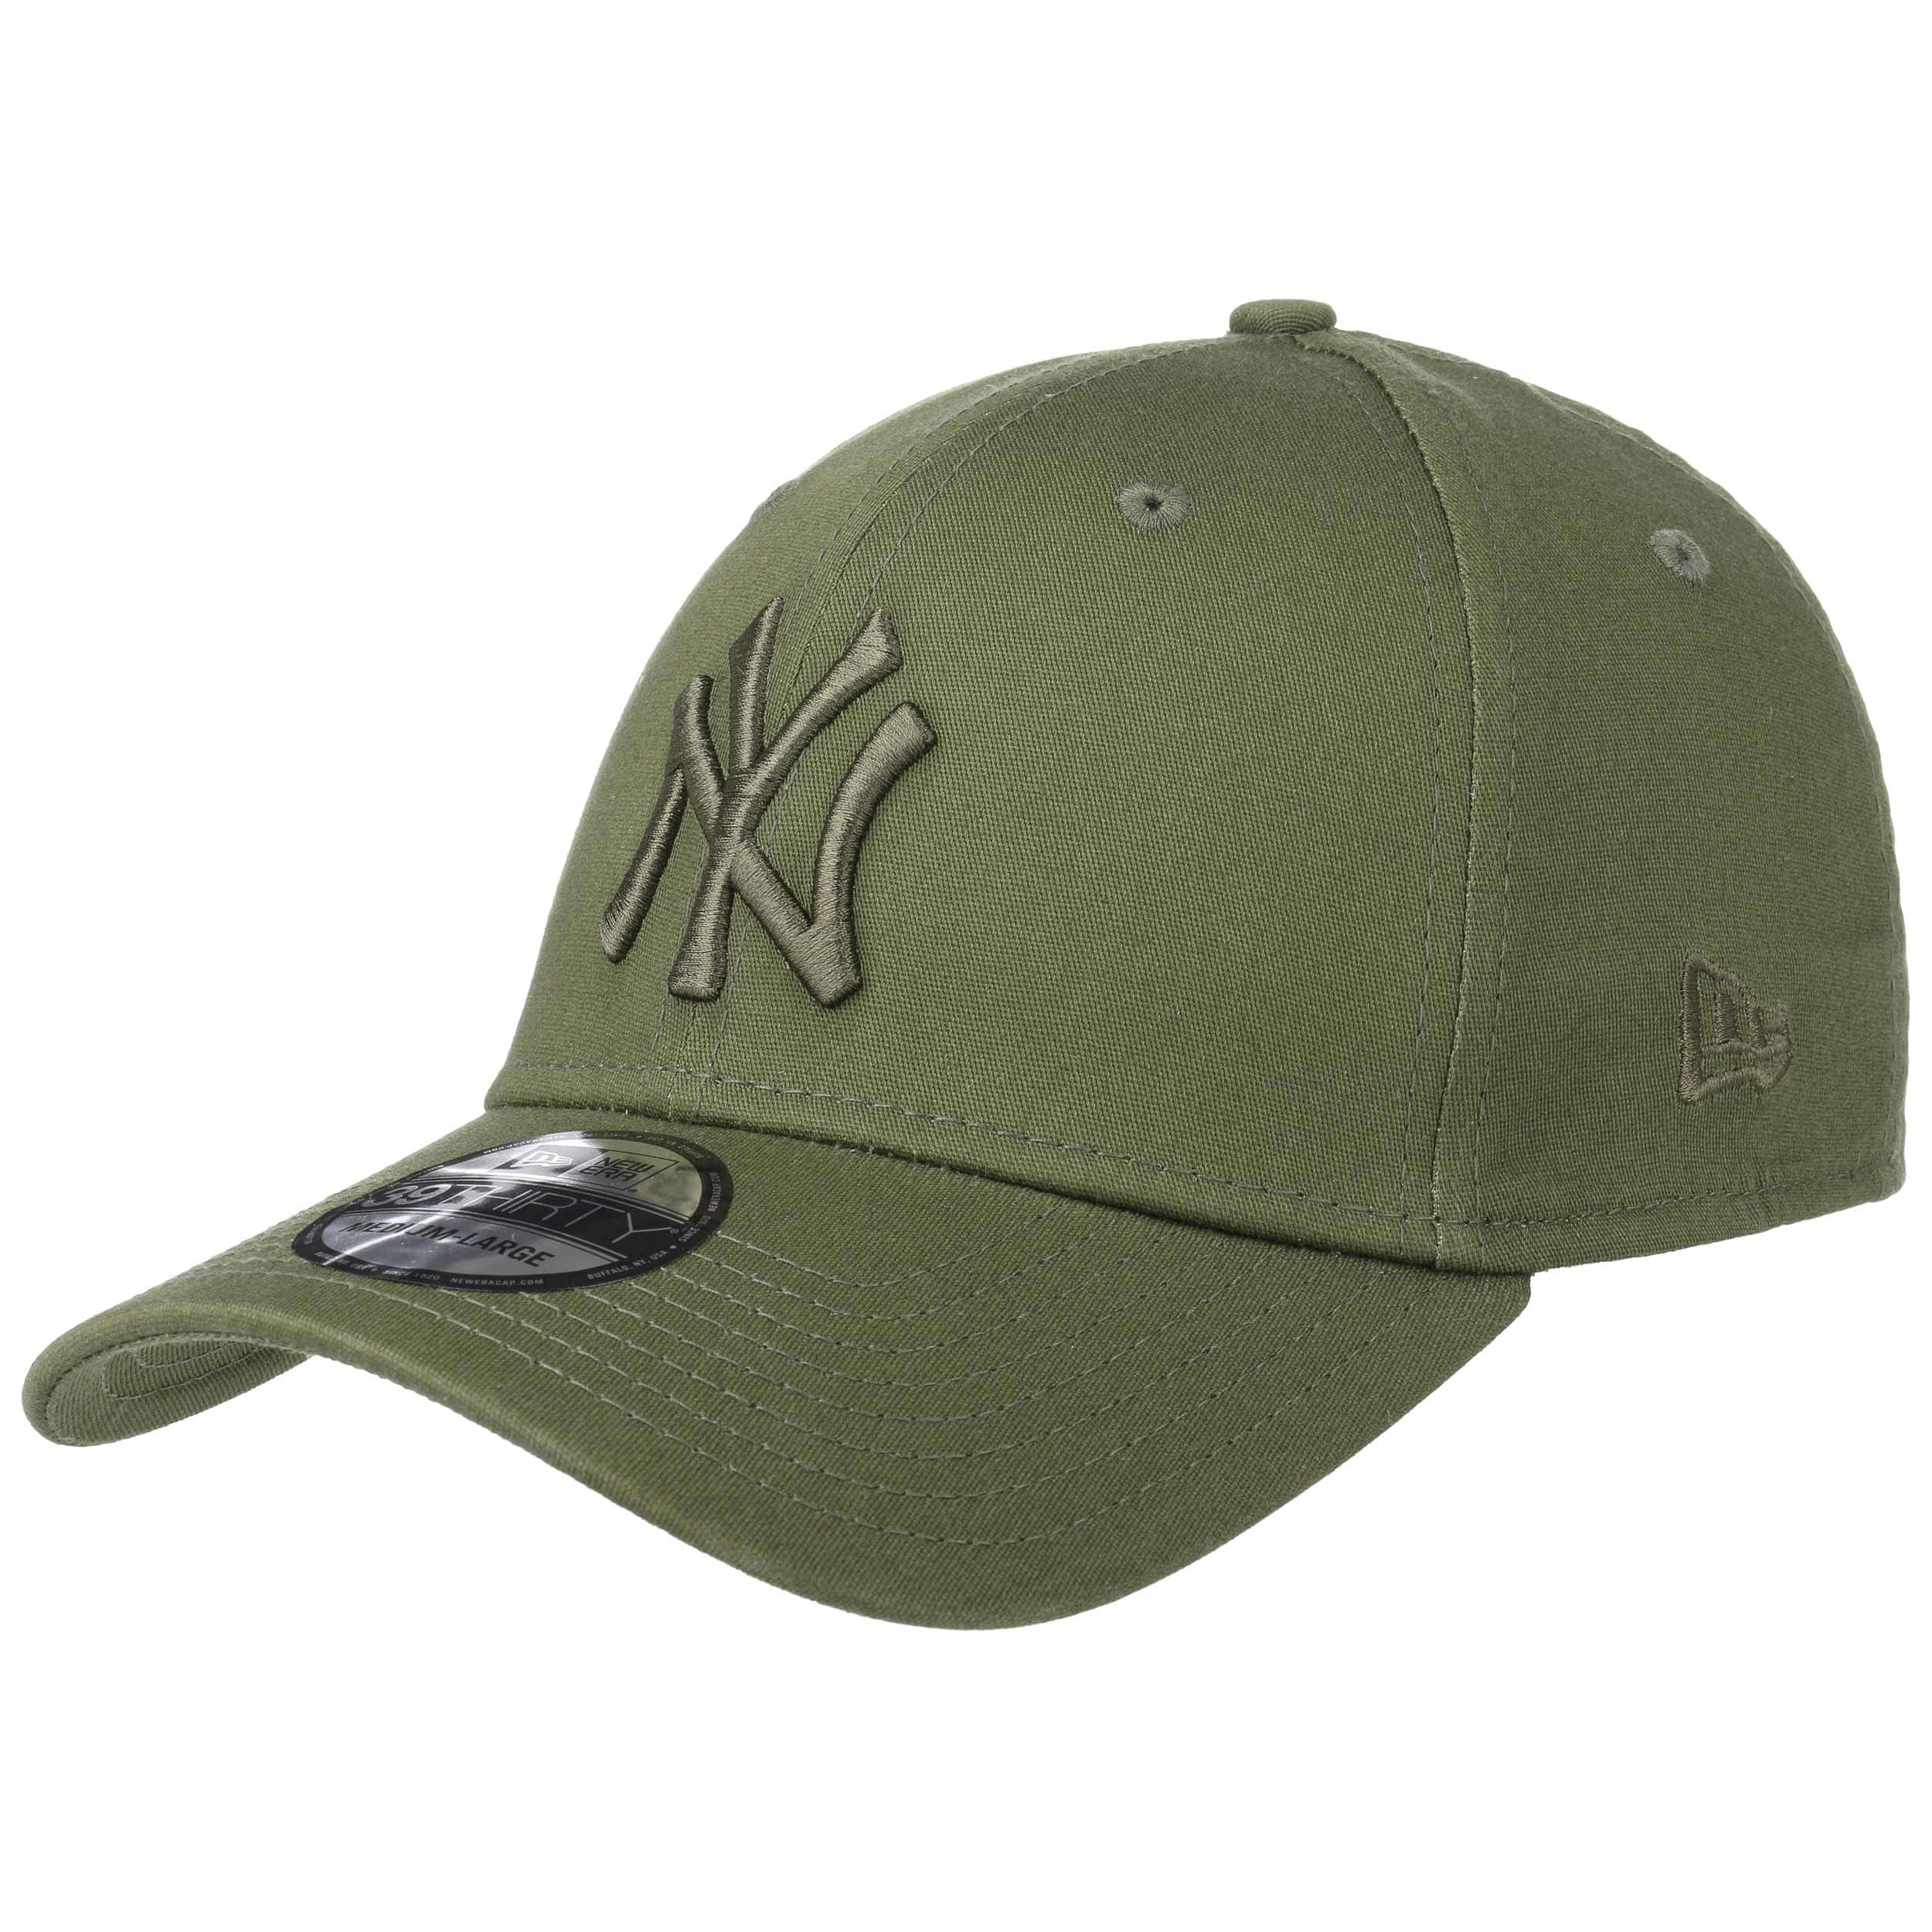 8db7dac712b55 Gorra 39Thirty League NY by New Era - Gorras - sombreroshop.es